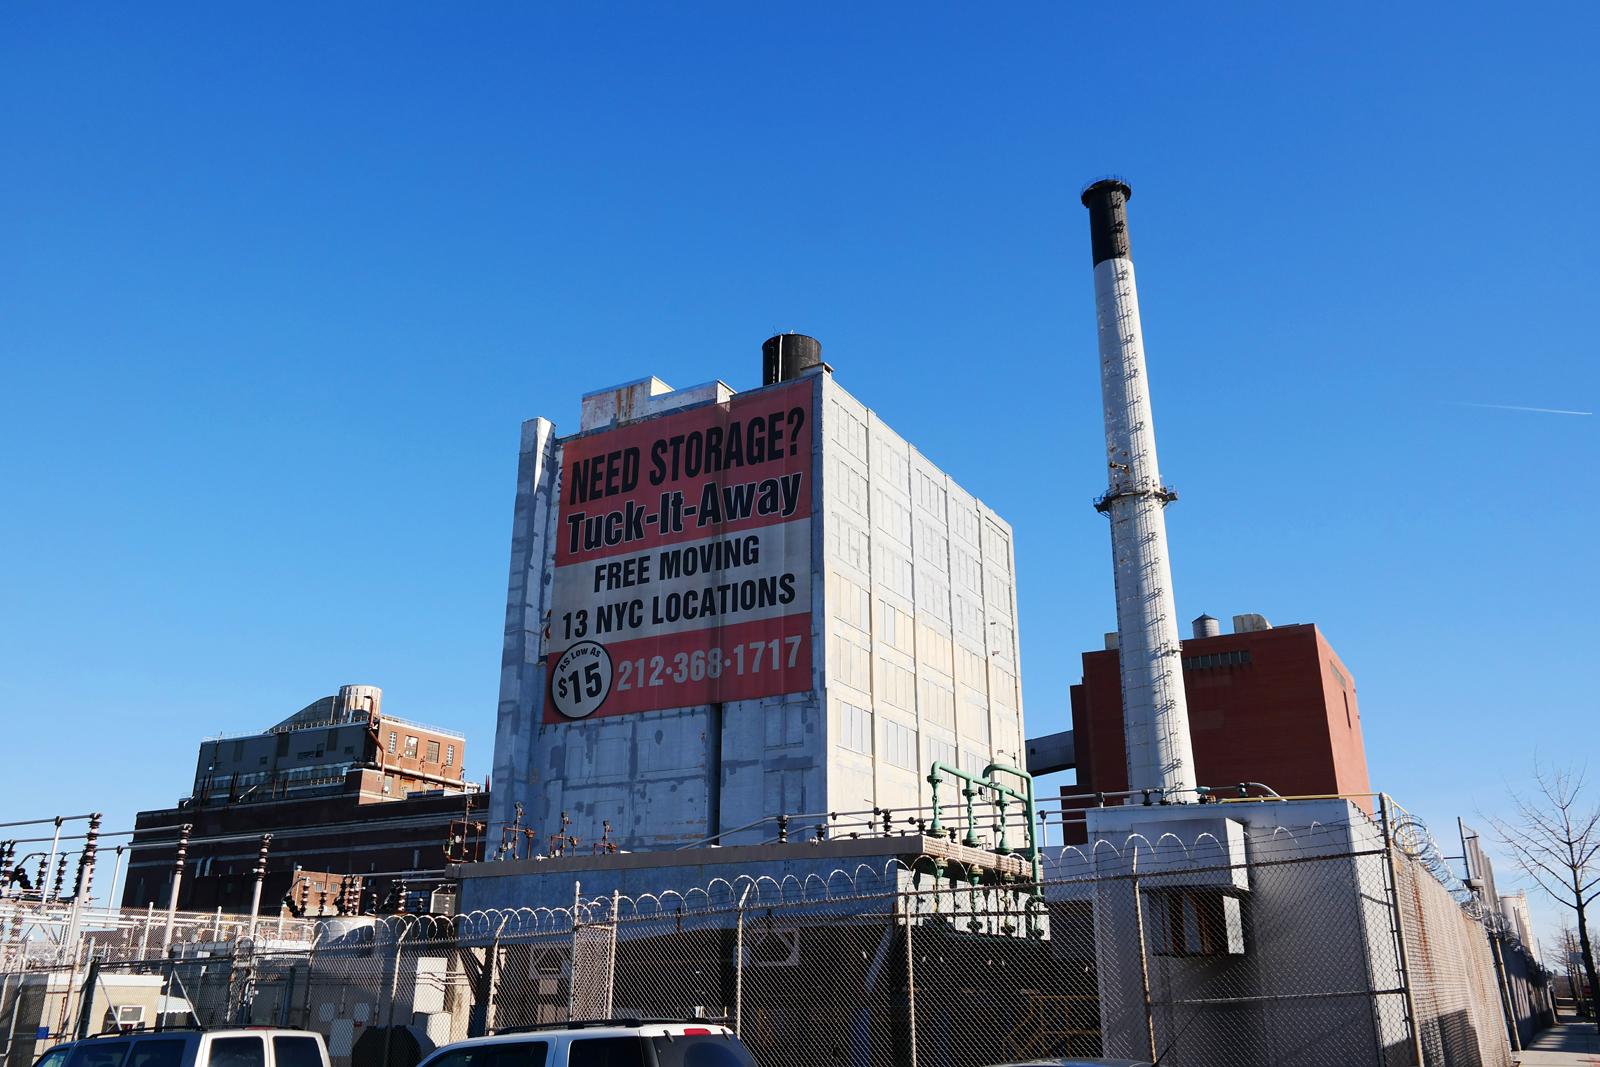 Building-Architecture-Dumbo-New-York-city-neighborhood-borough-of-Brooklyn-imagelogger-VSCOcam-photo-united-states-of-paris-blog